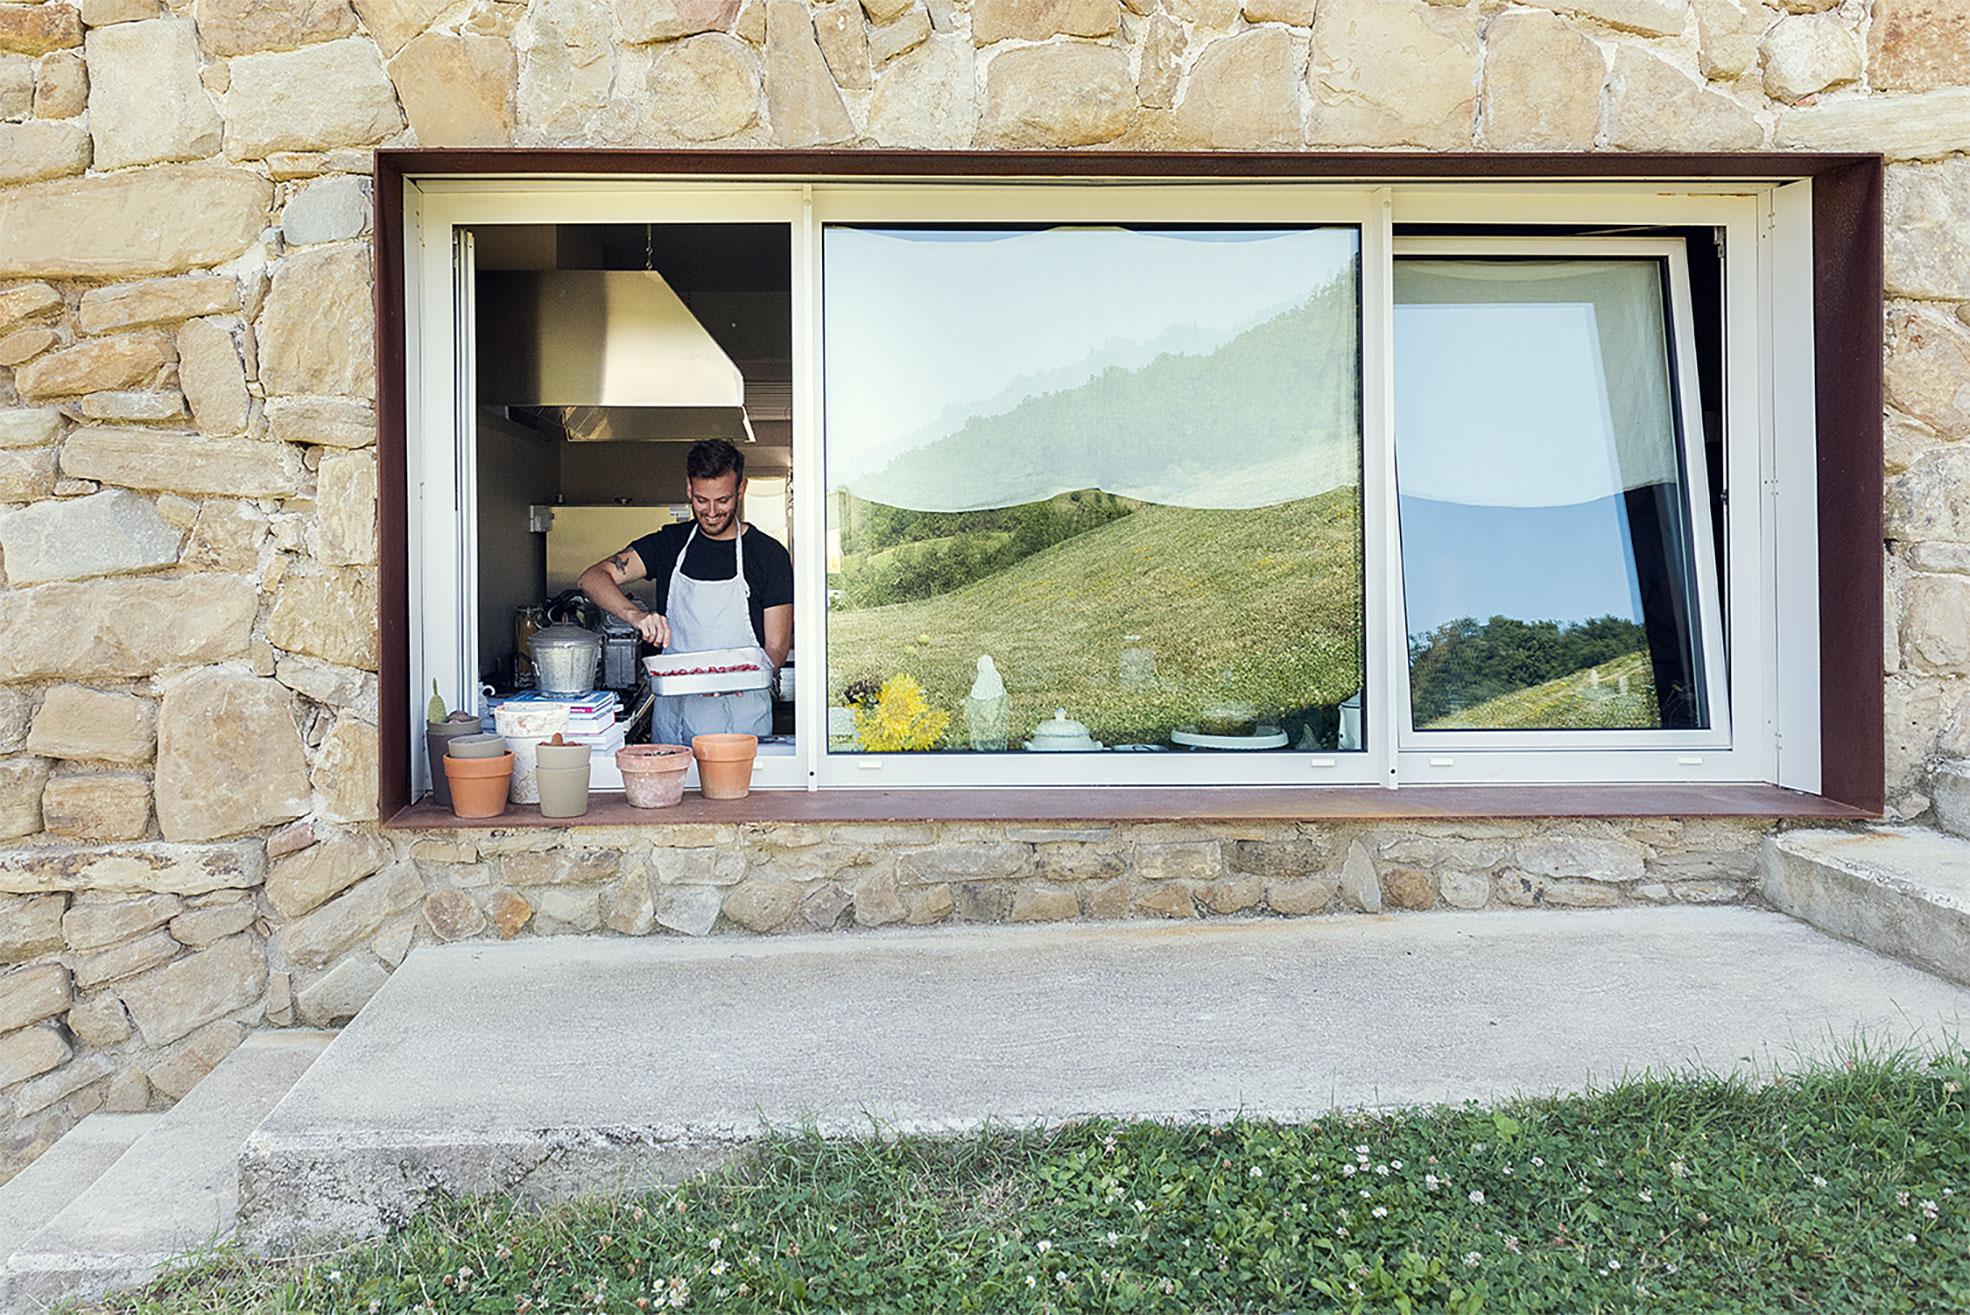 Gnanmbox cooking in Malatetsa Maison de Charme in the marche hills Photographer Maria Teresa Furnari